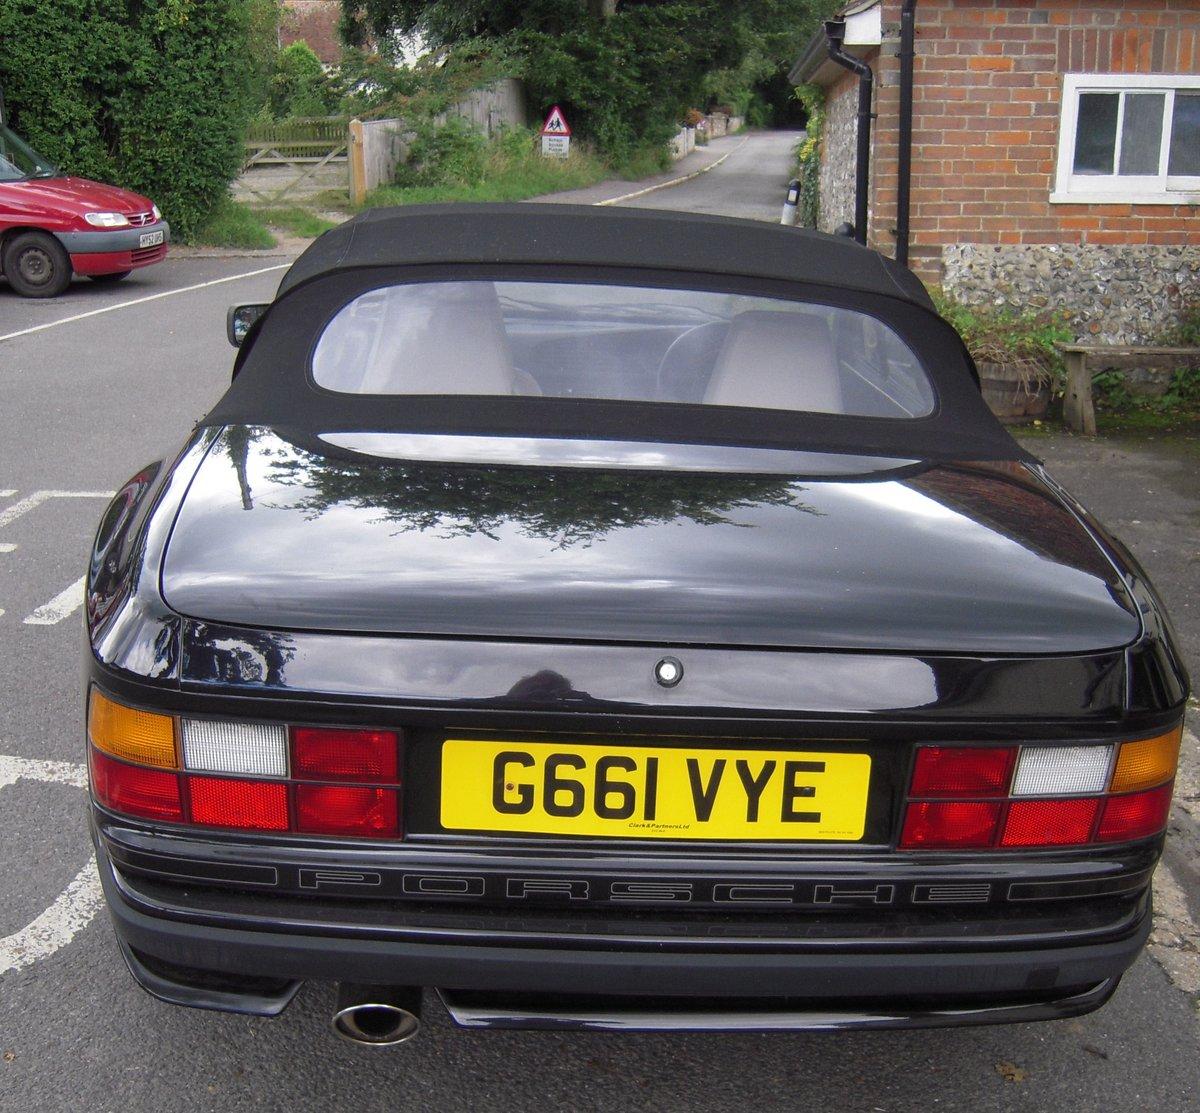 1990 PORSCHE 944 S2 CABRIOLET  For Sale (picture 4 of 6)